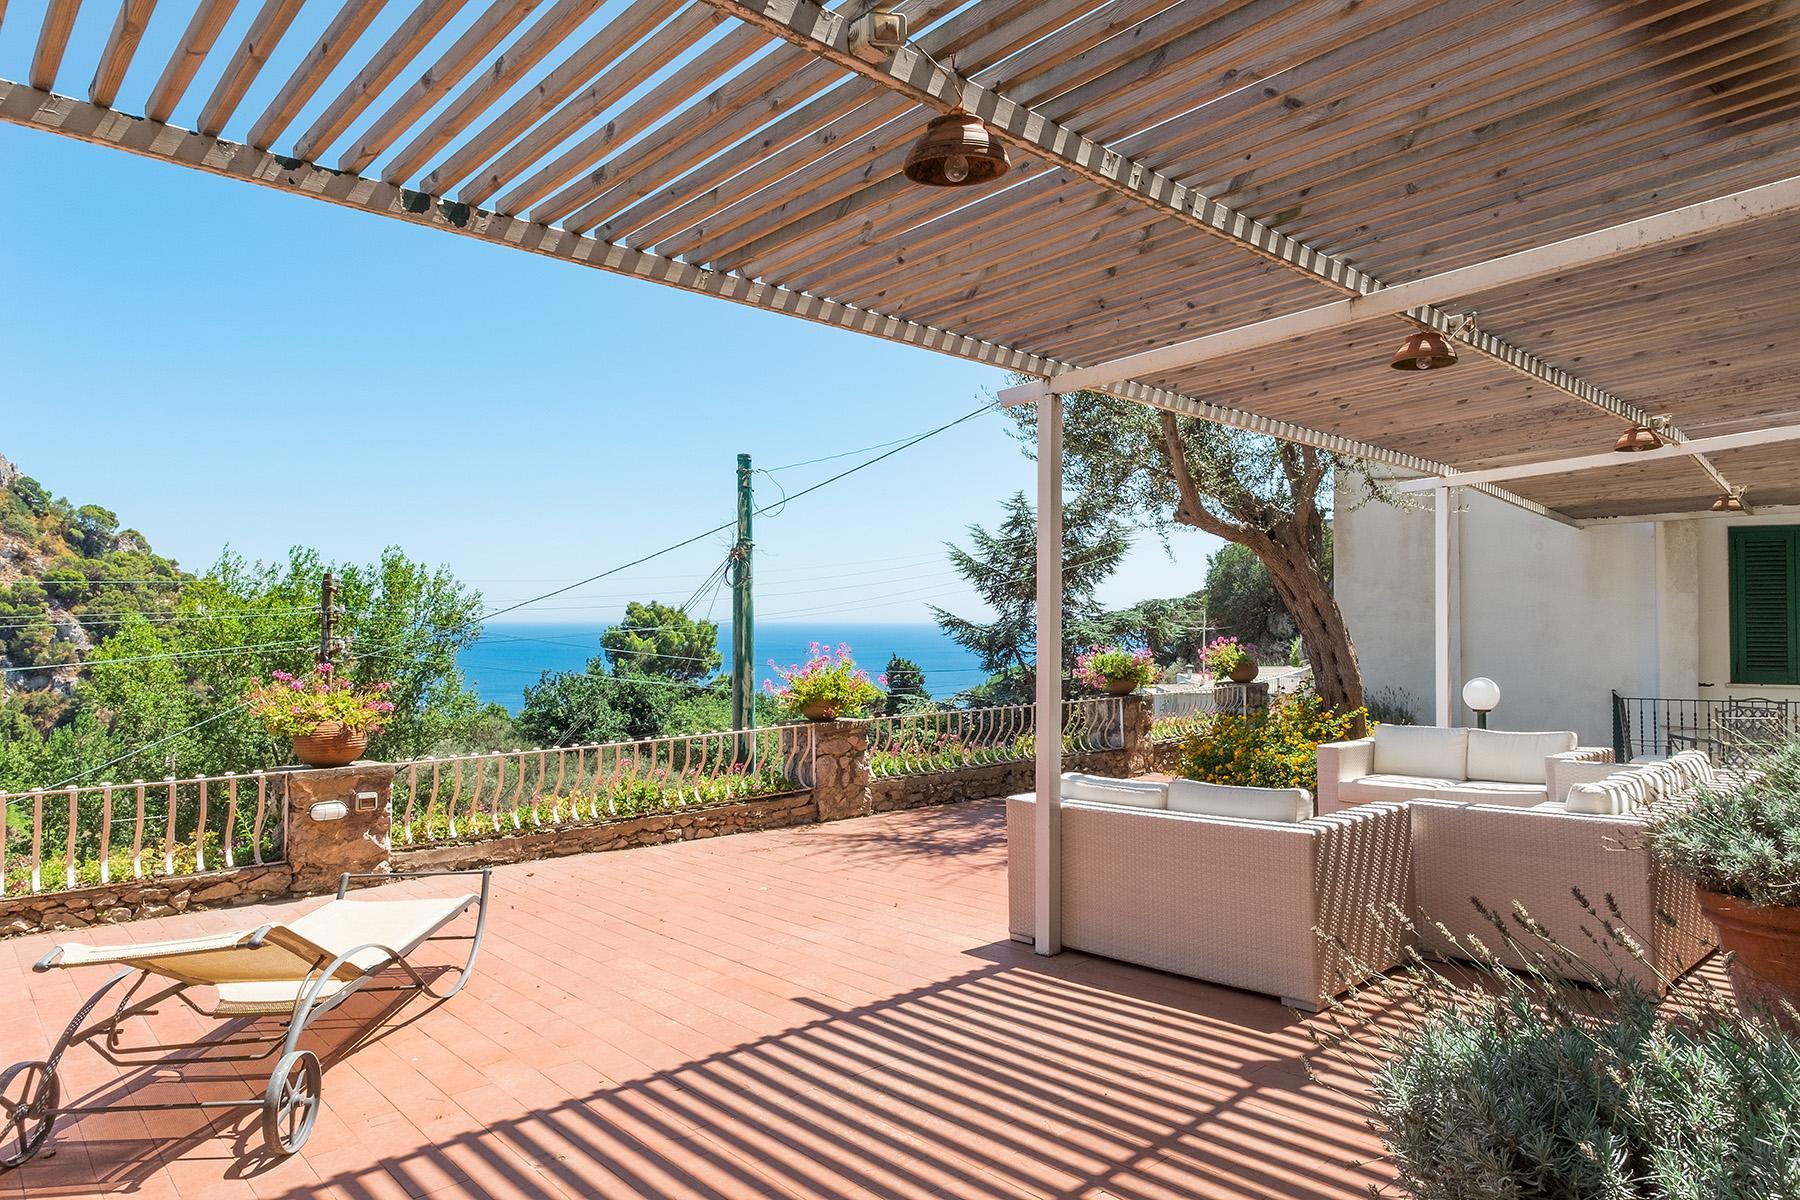 Прекрасная вилла с панорамным видом на море в центре легендарного острова Капри, Италия - 1